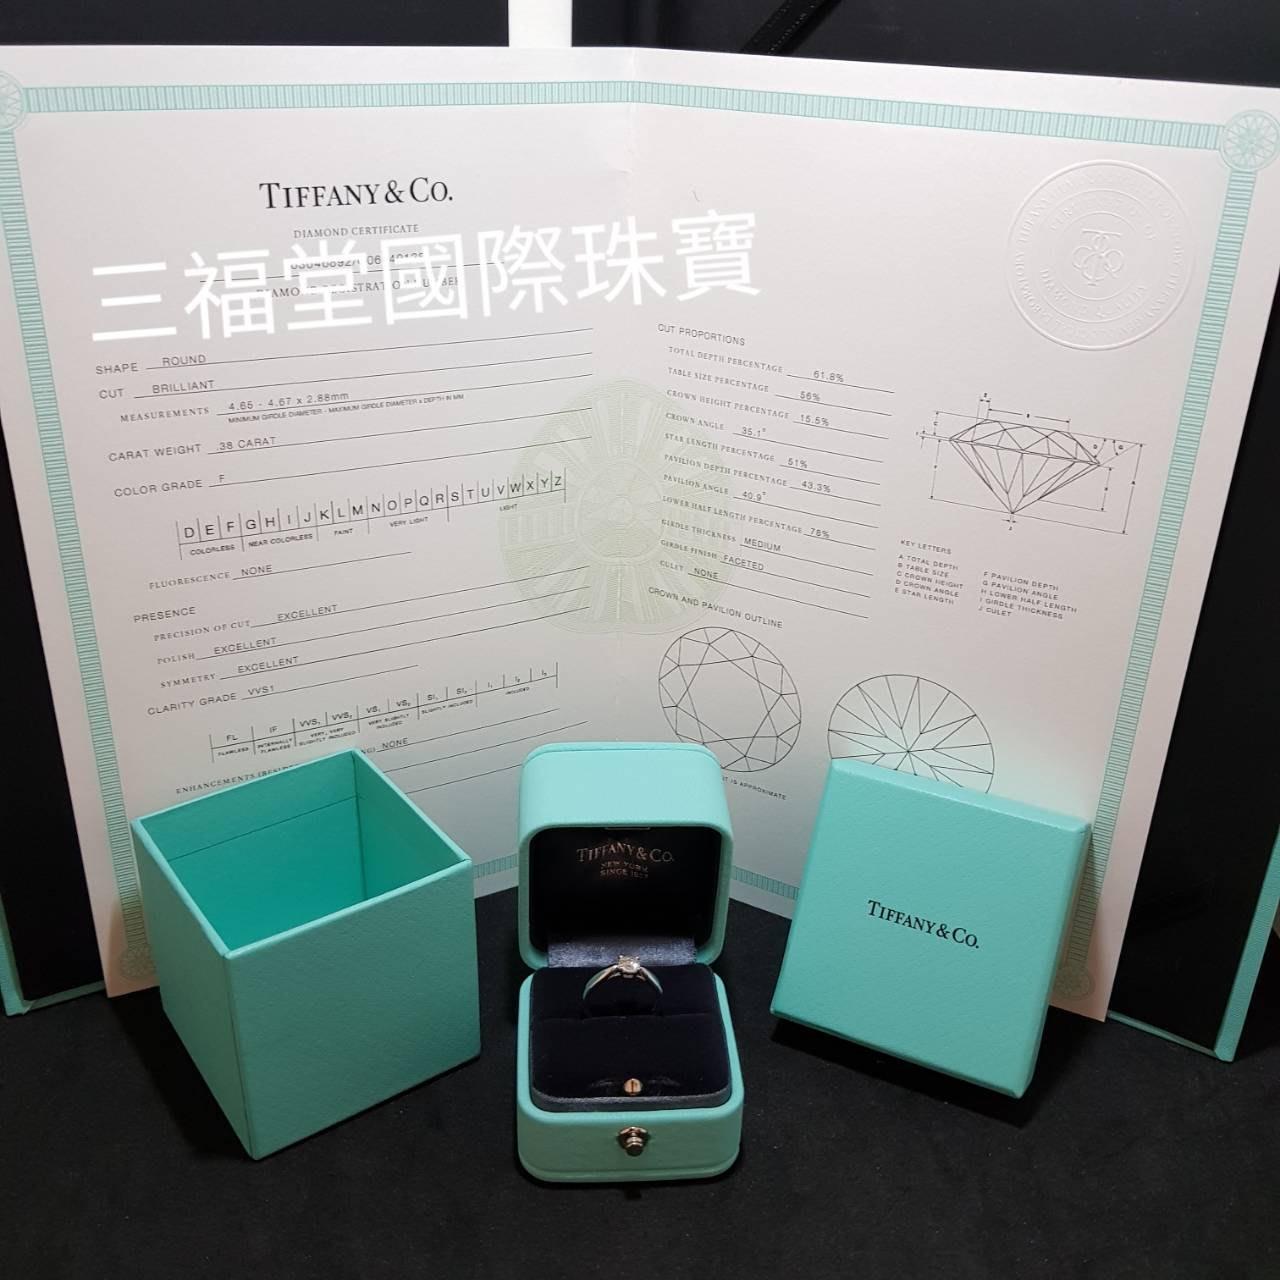 《三福堂國際珠寶名品1300》Tiffany Harmony™ 鉑金鑽戒 0.38CT /  F VVS1 3EX